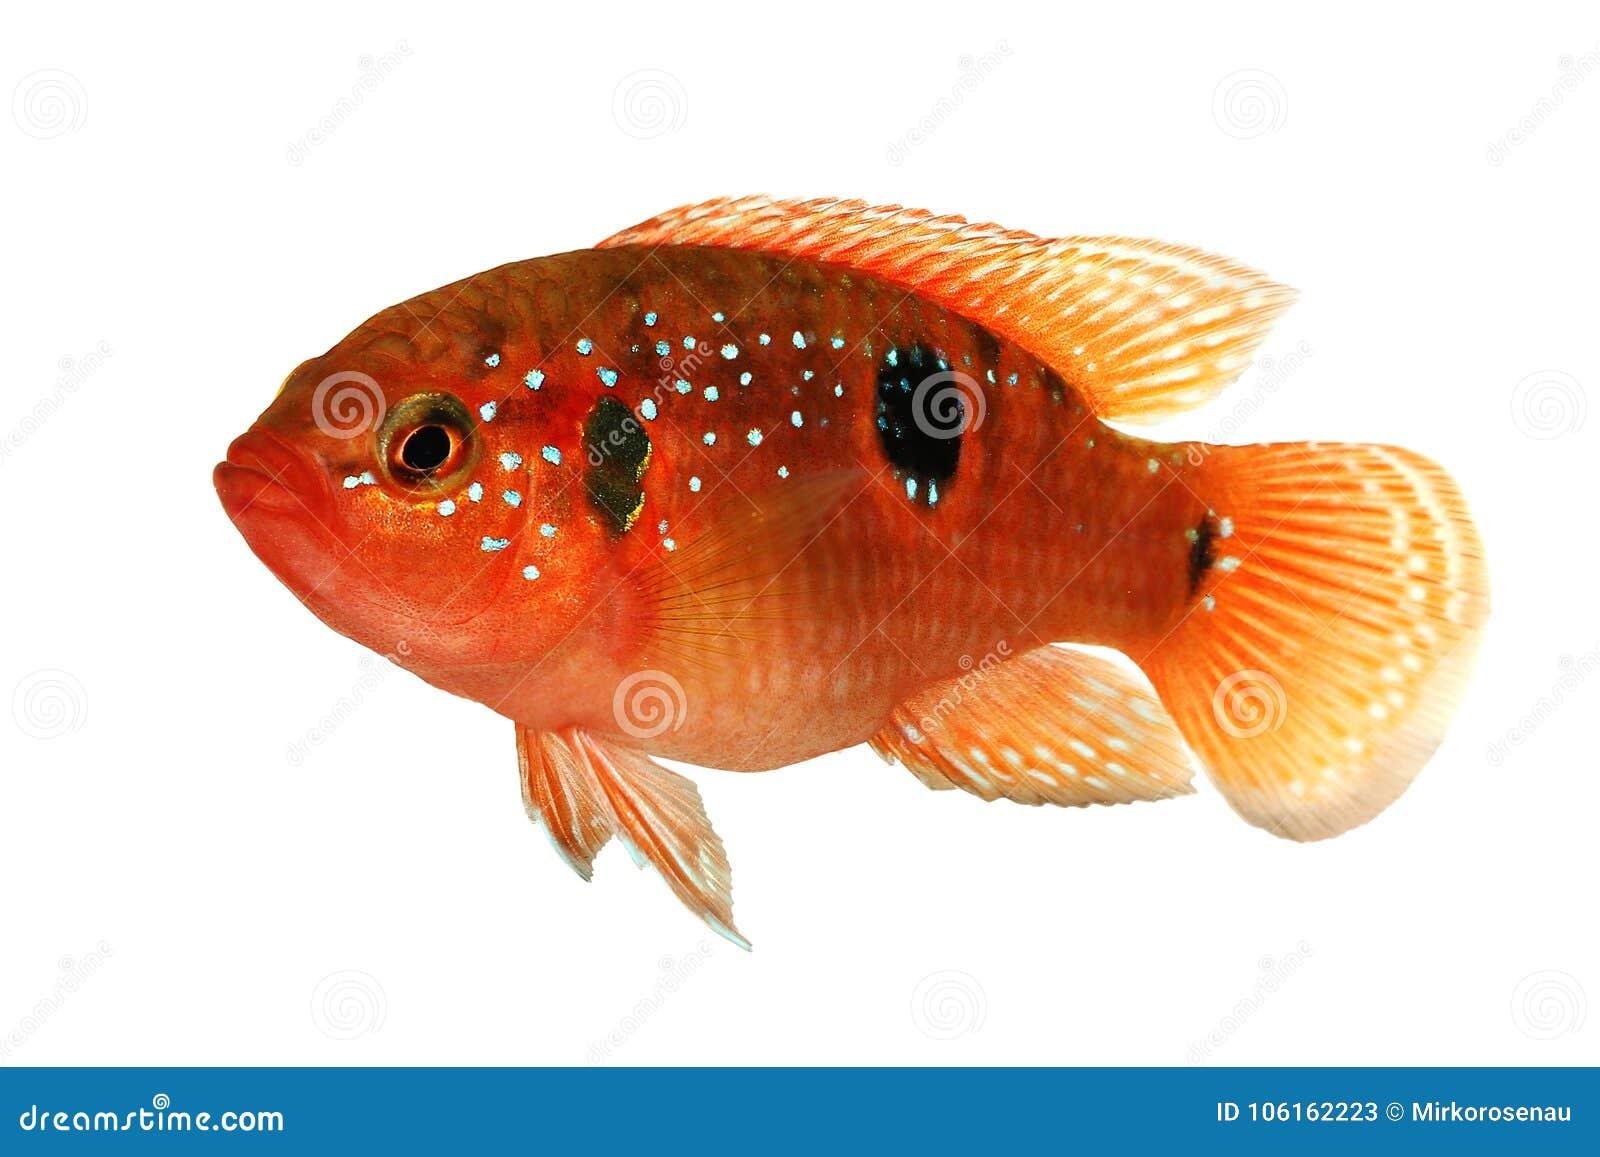 Information File Name: Jewel Cichlid Hemichromis Bimaculatus ...